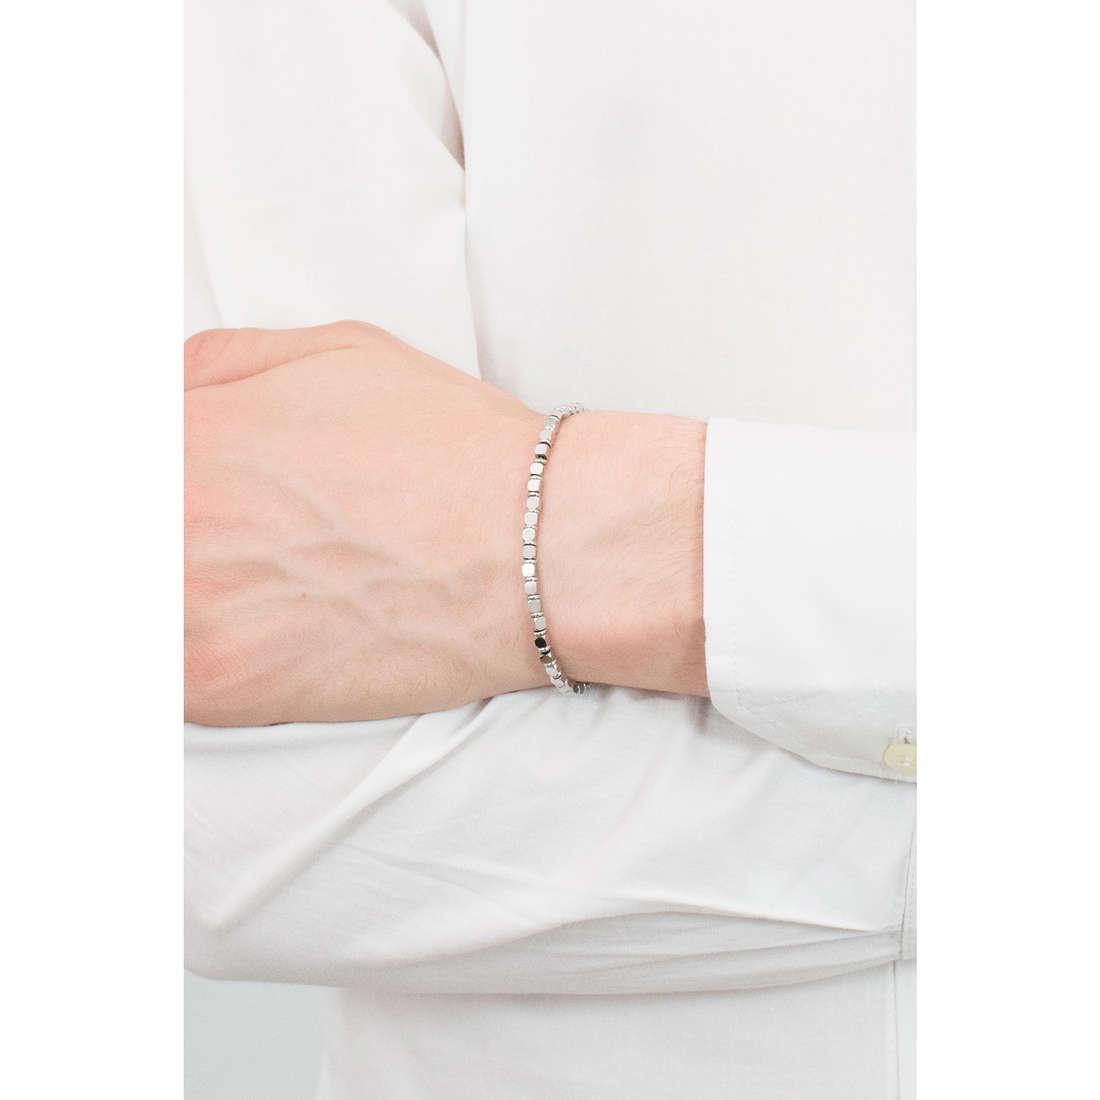 Morellato bracelets Ematite man SAHT04 photo wearing